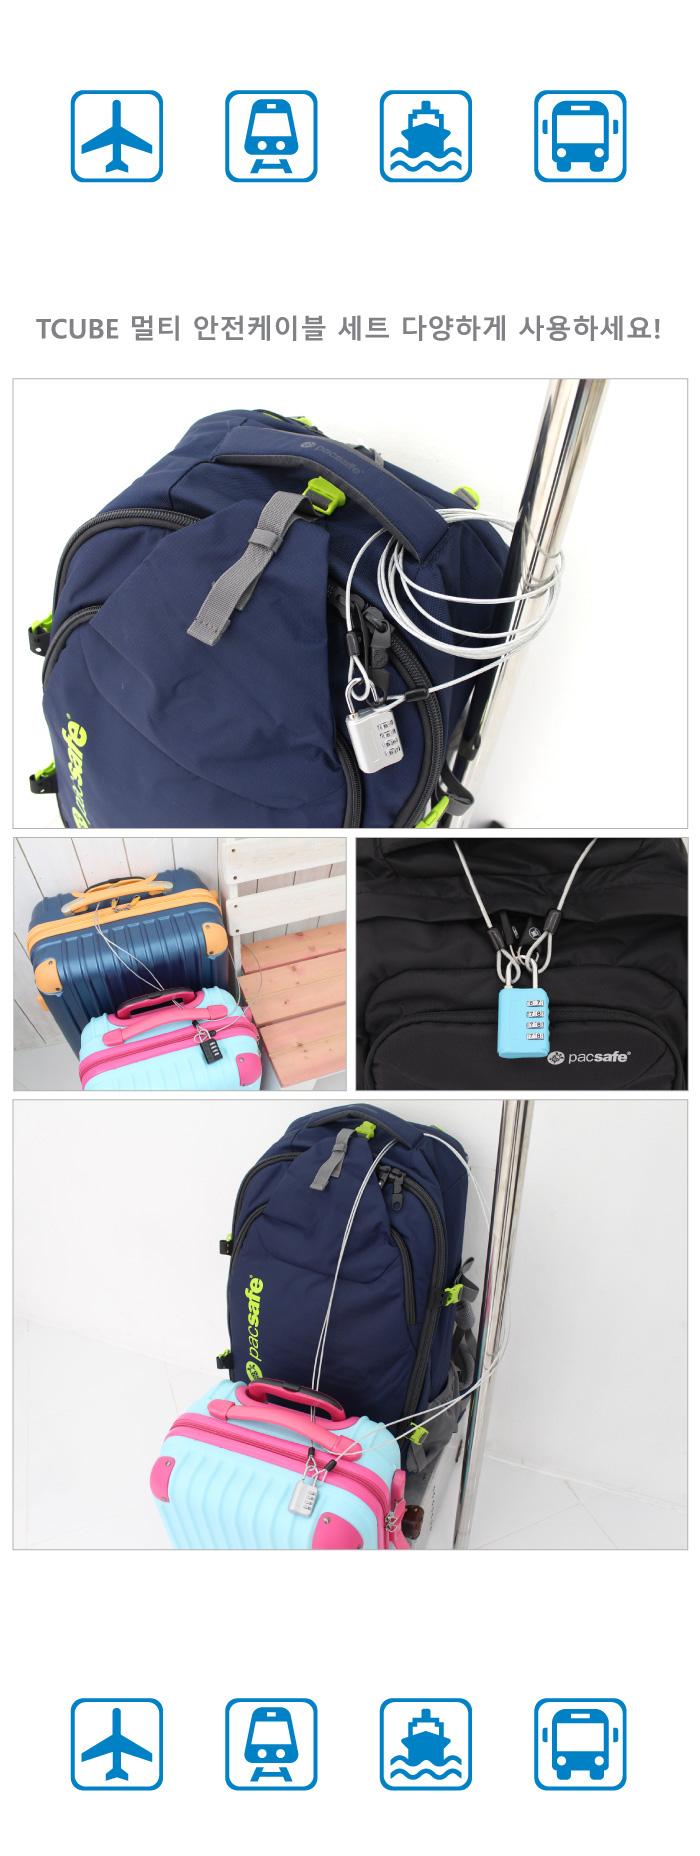 TCUBE - 멀티 안전케이블 + 4다이얼 안전자물쇠 세트 - 2.5M7,800원-티큐브여행/레포츠, 캐리어, 보호용품, 자물쇠바보사랑TCUBE - 멀티 안전케이블 + 4다이얼 안전자물쇠 세트 - 2.5M7,800원-티큐브여행/레포츠, 캐리어, 보호용품, 자물쇠바보사랑